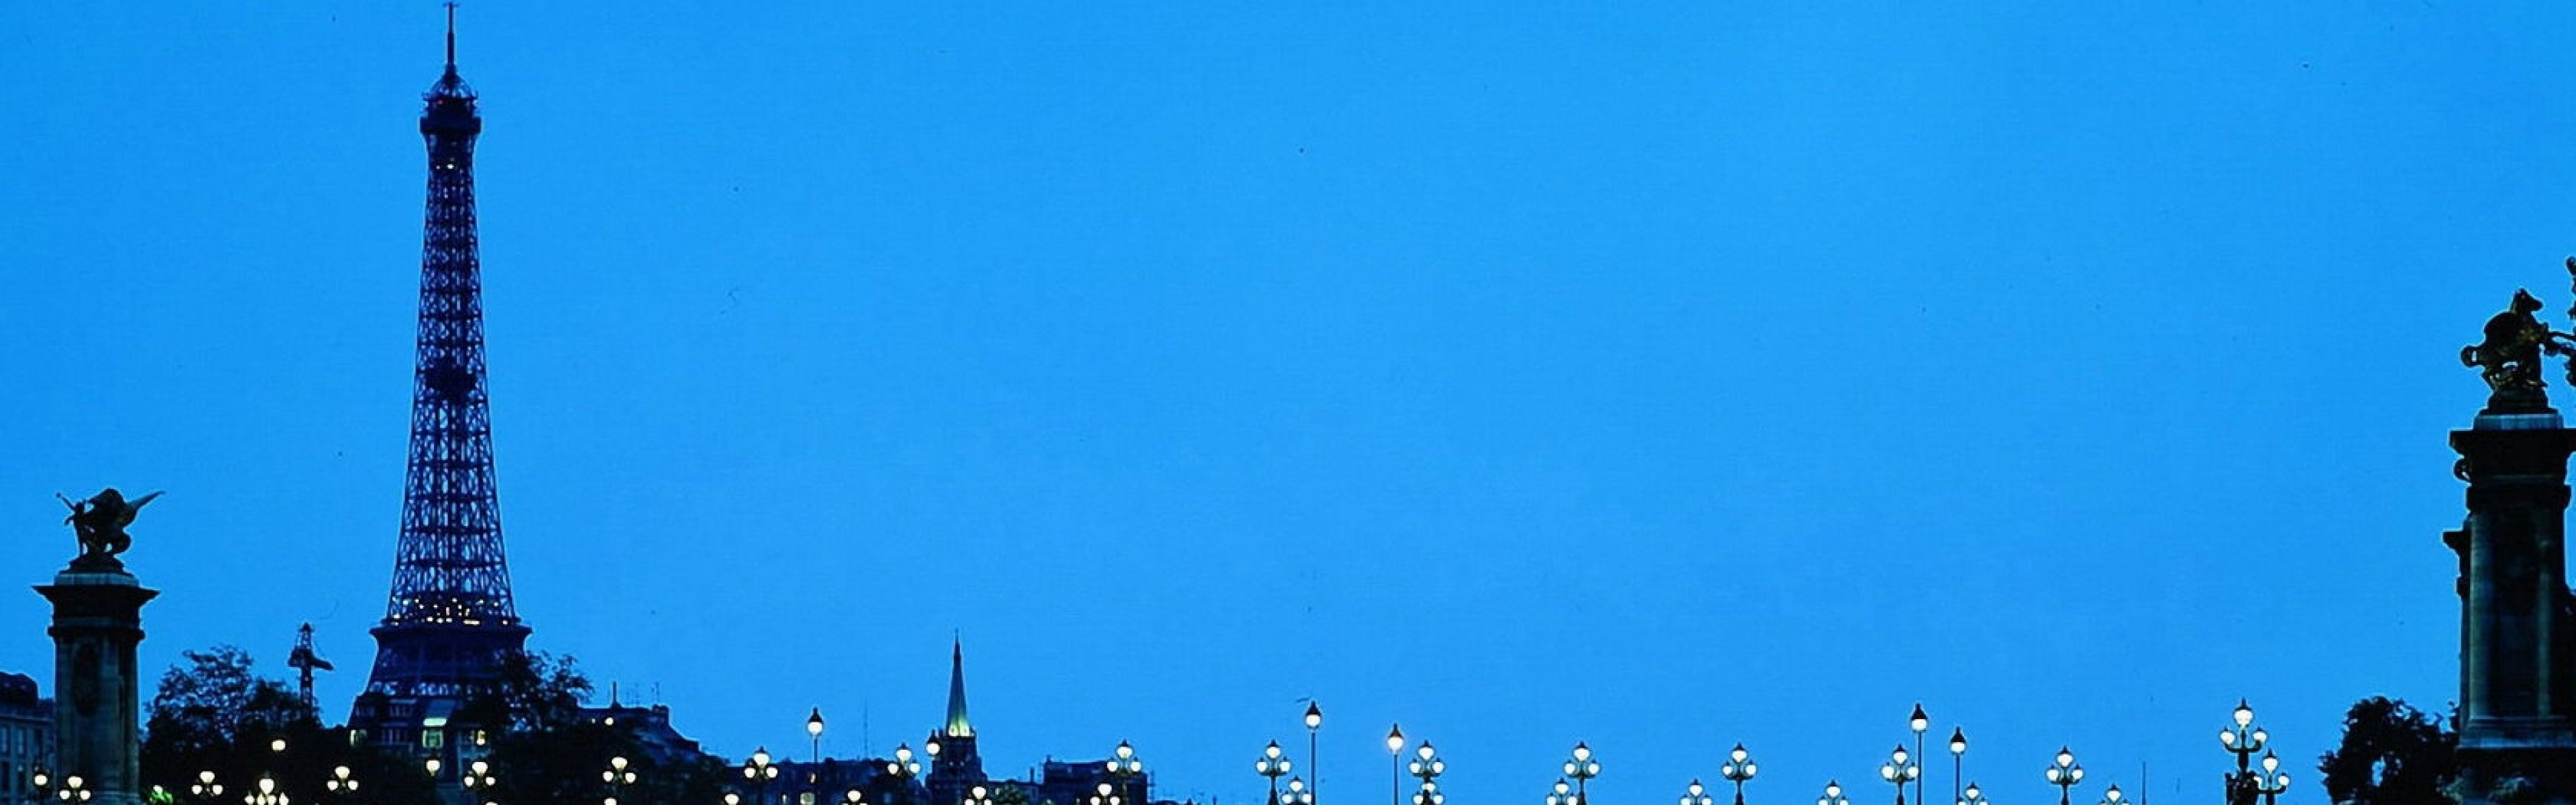 Wallpaper paris, france, eiffel tower, bridge, water, blue sky,